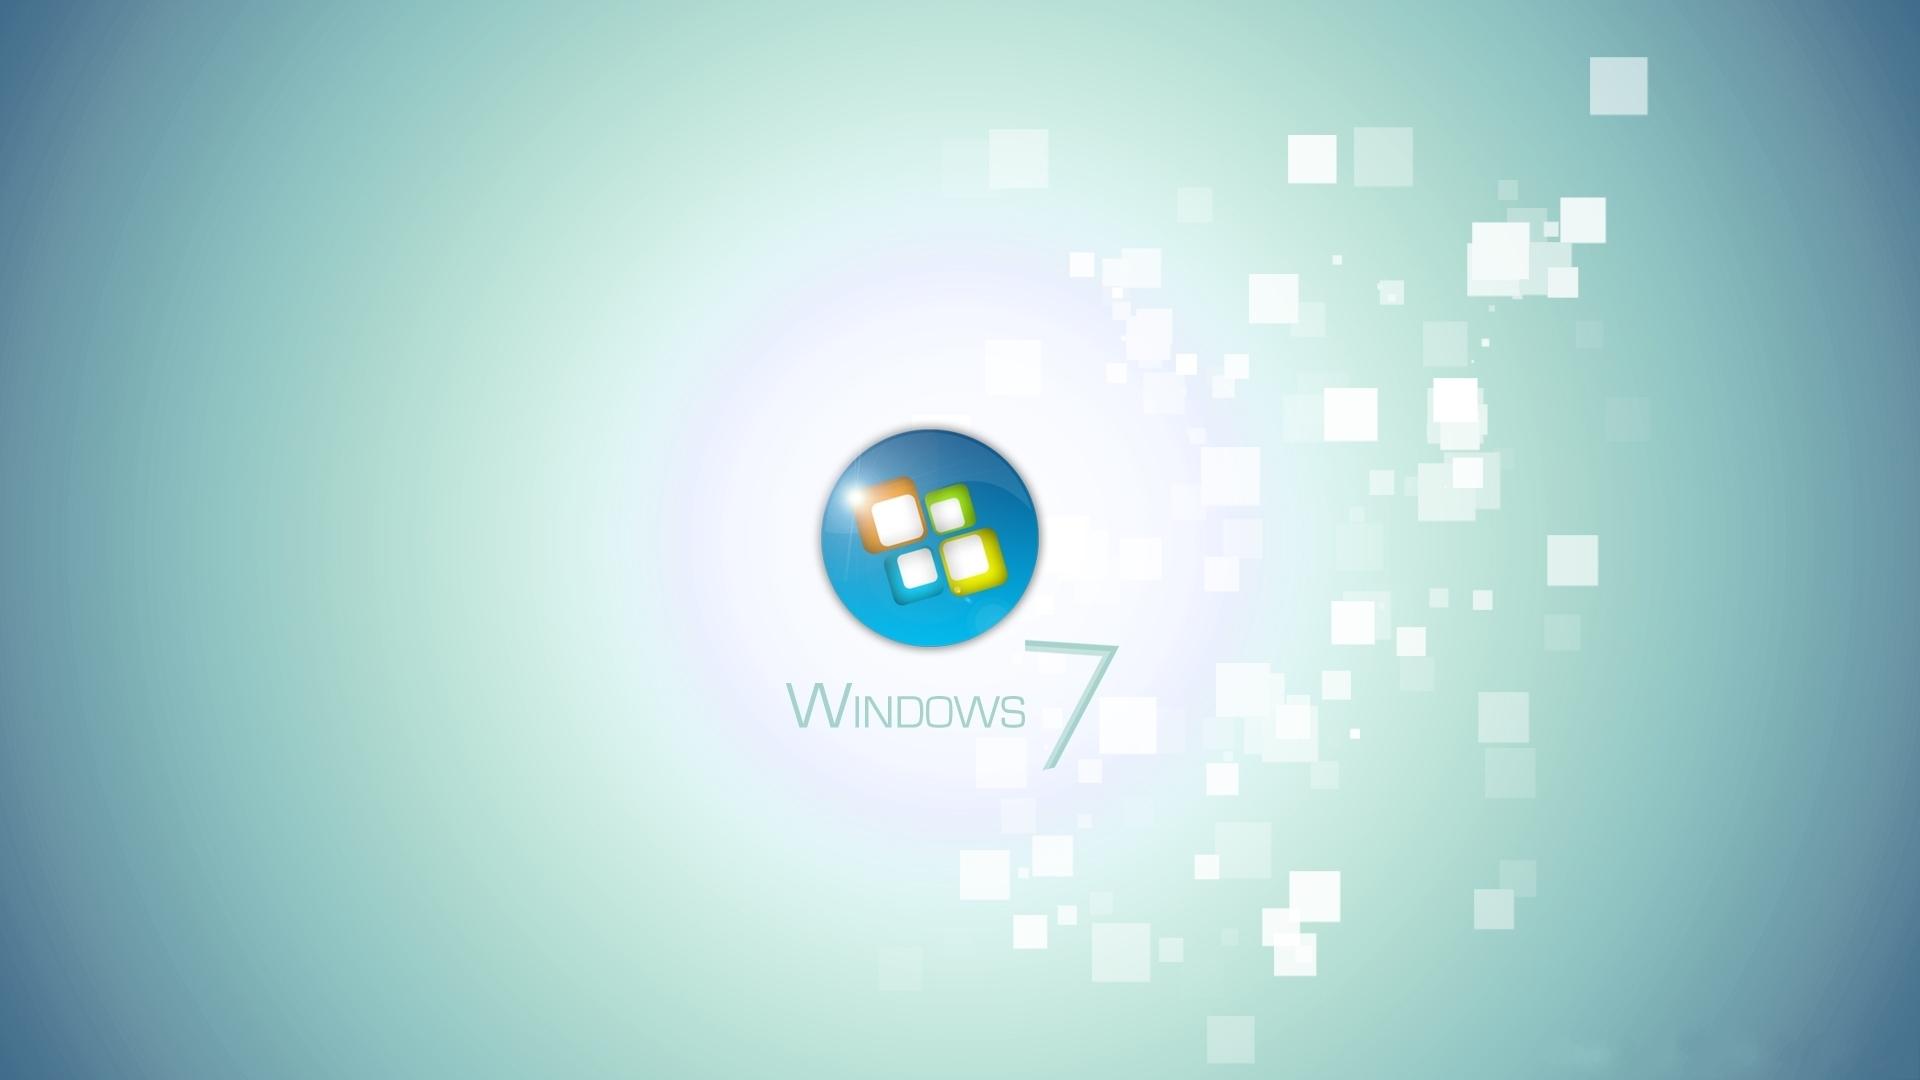 Фотографии Windows 7 Windows Компьютеры